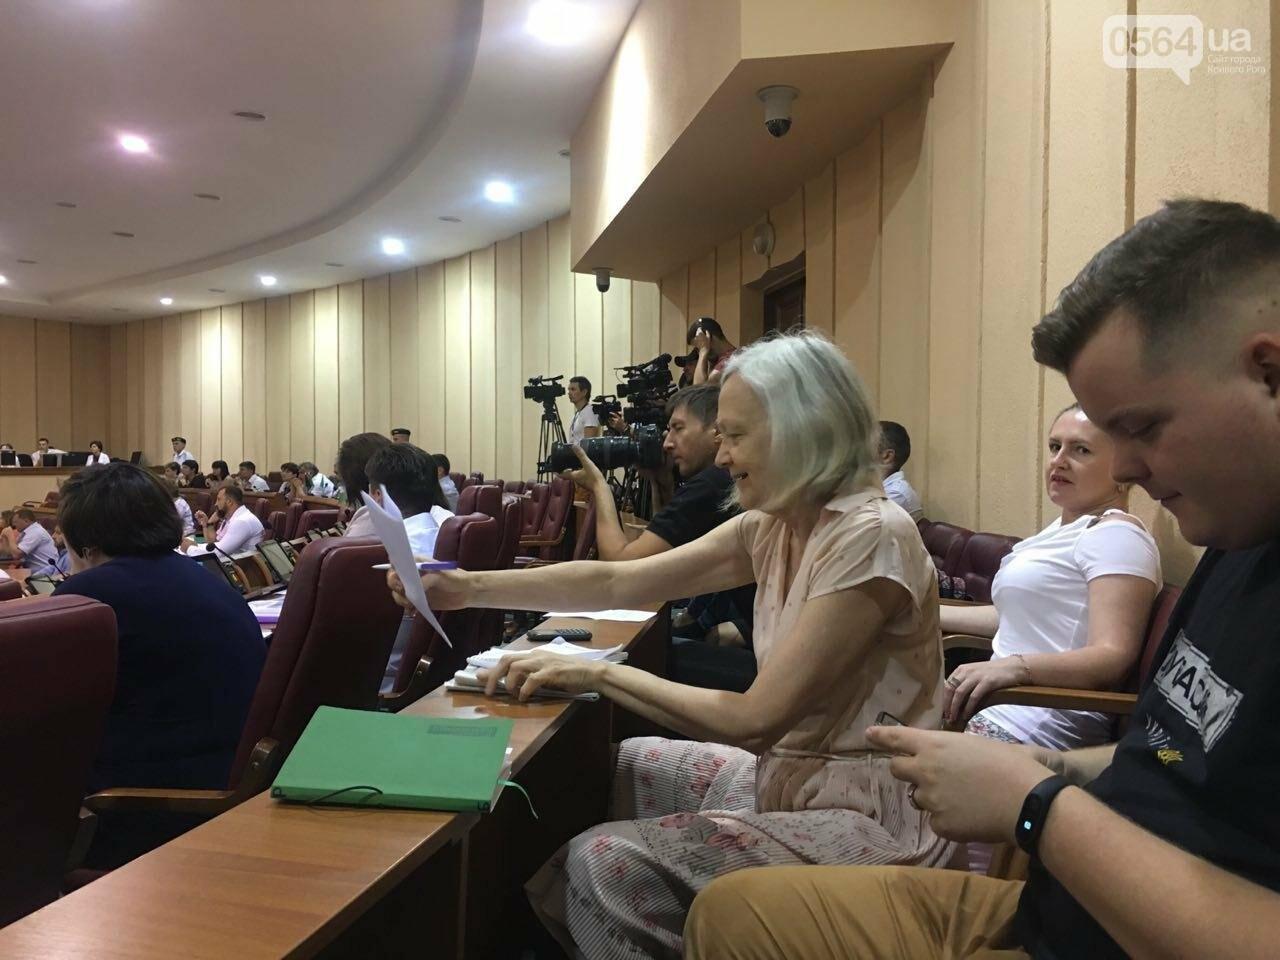 Криворожский горсовет не поддержал петицию о запрете Марша равенства, - ФОТО, фото-7